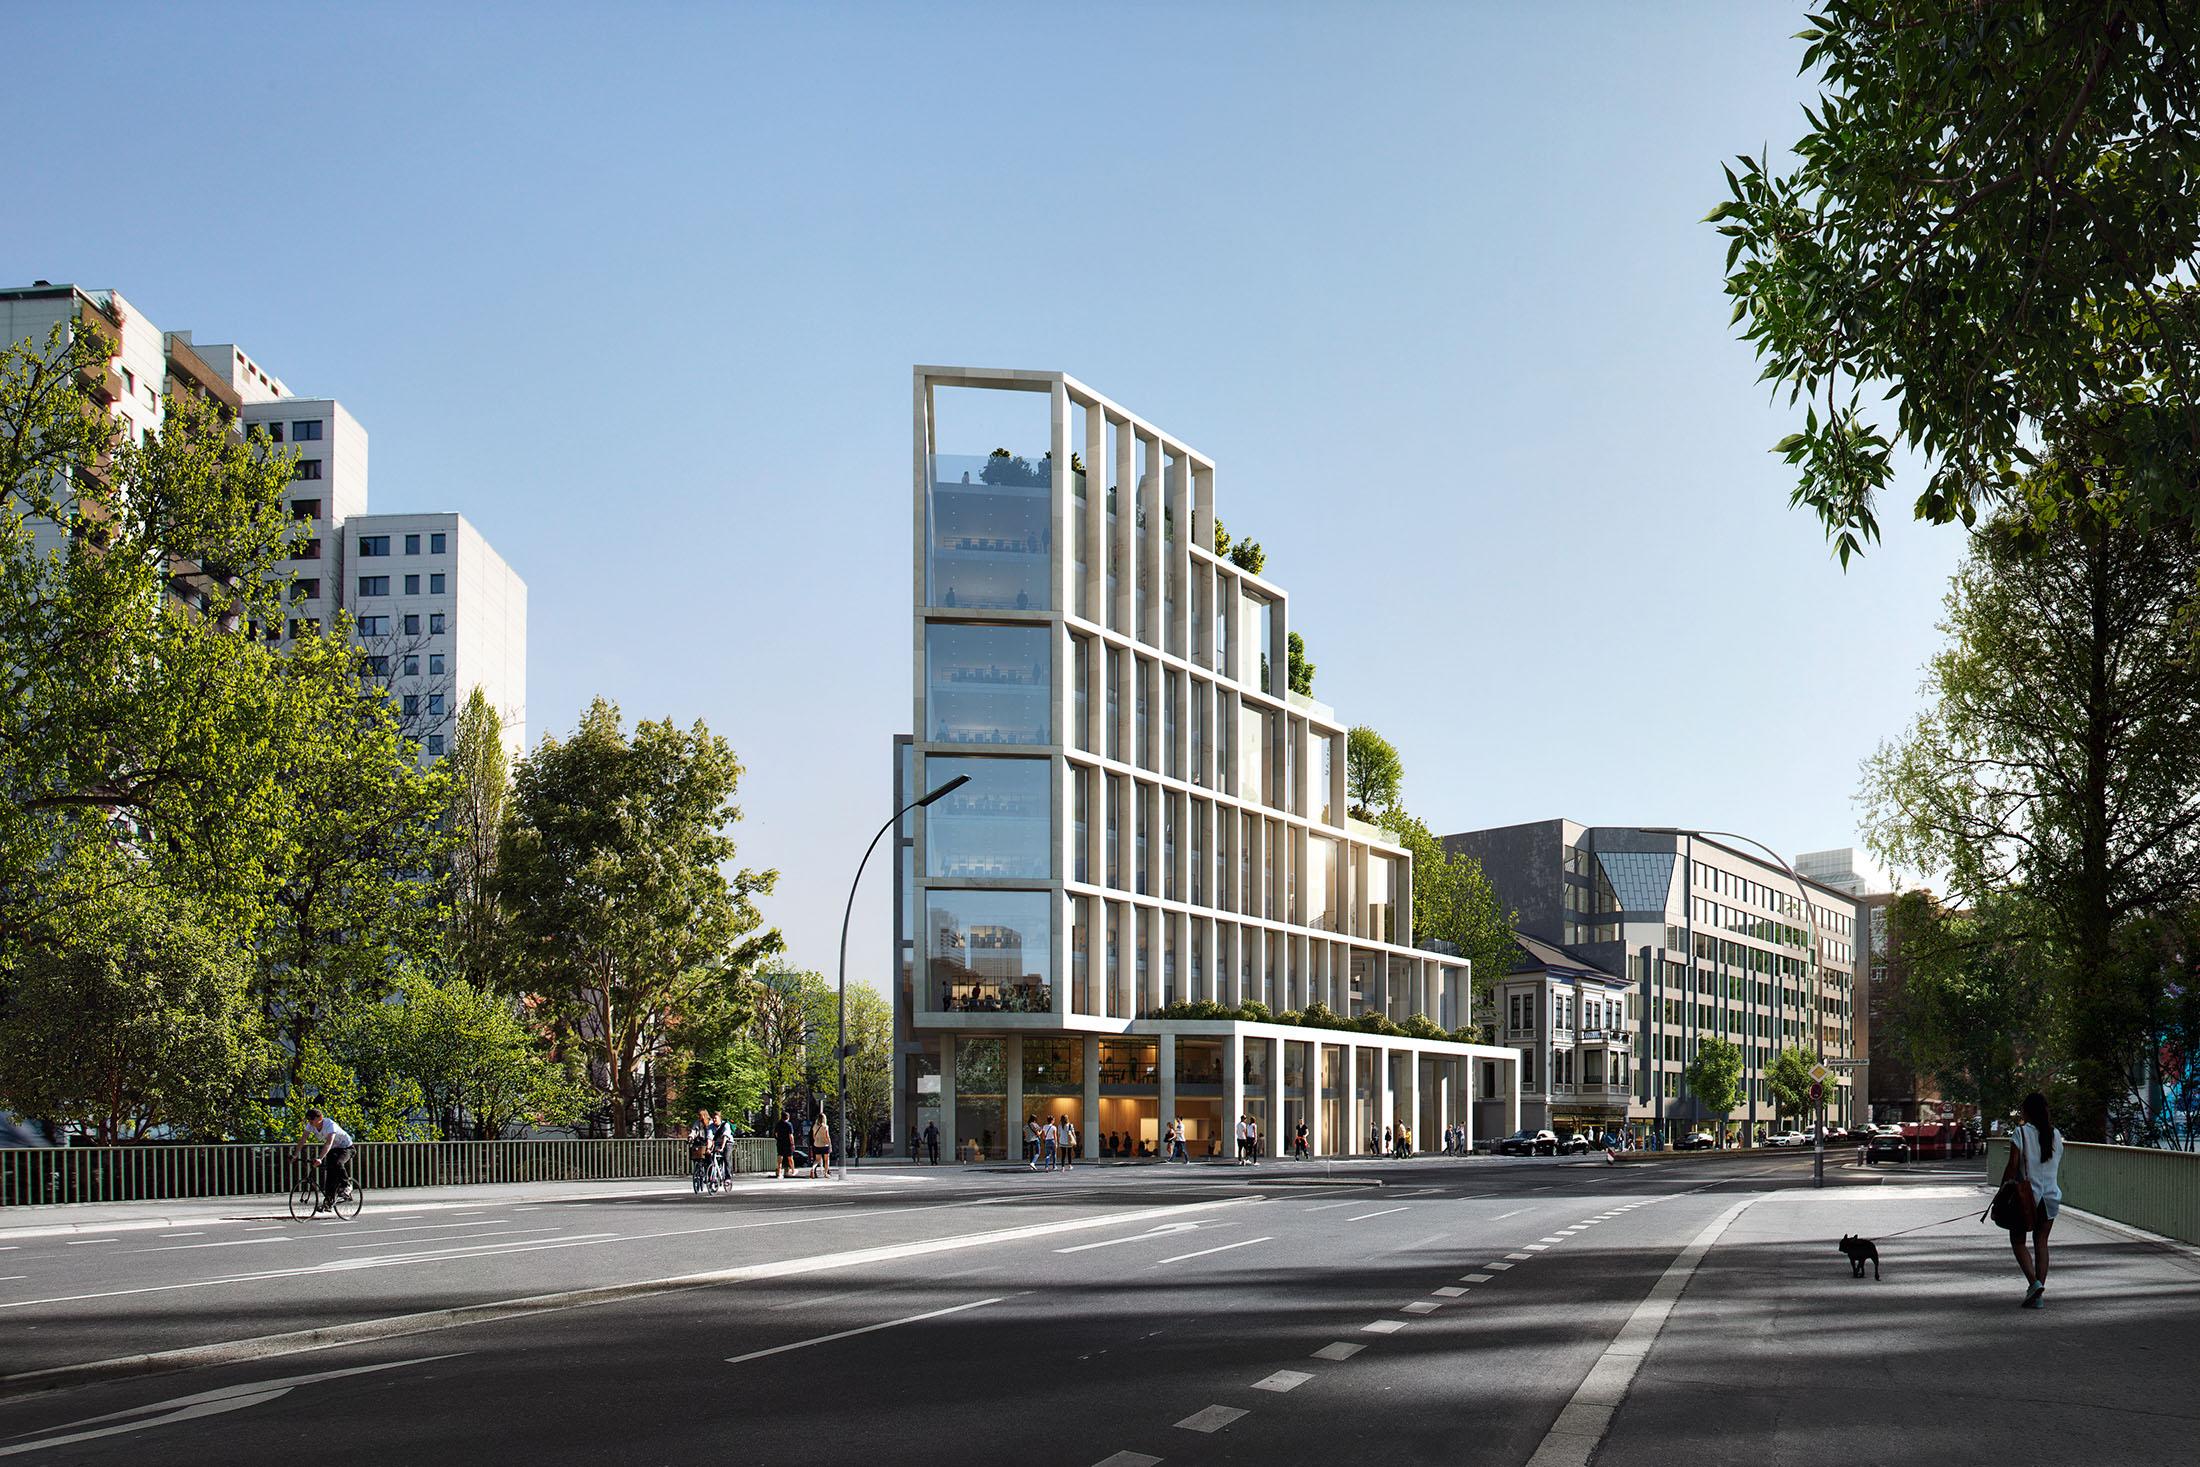 CF Moller, Berlin Hyp Bank Head Quarters, Germany, 2020